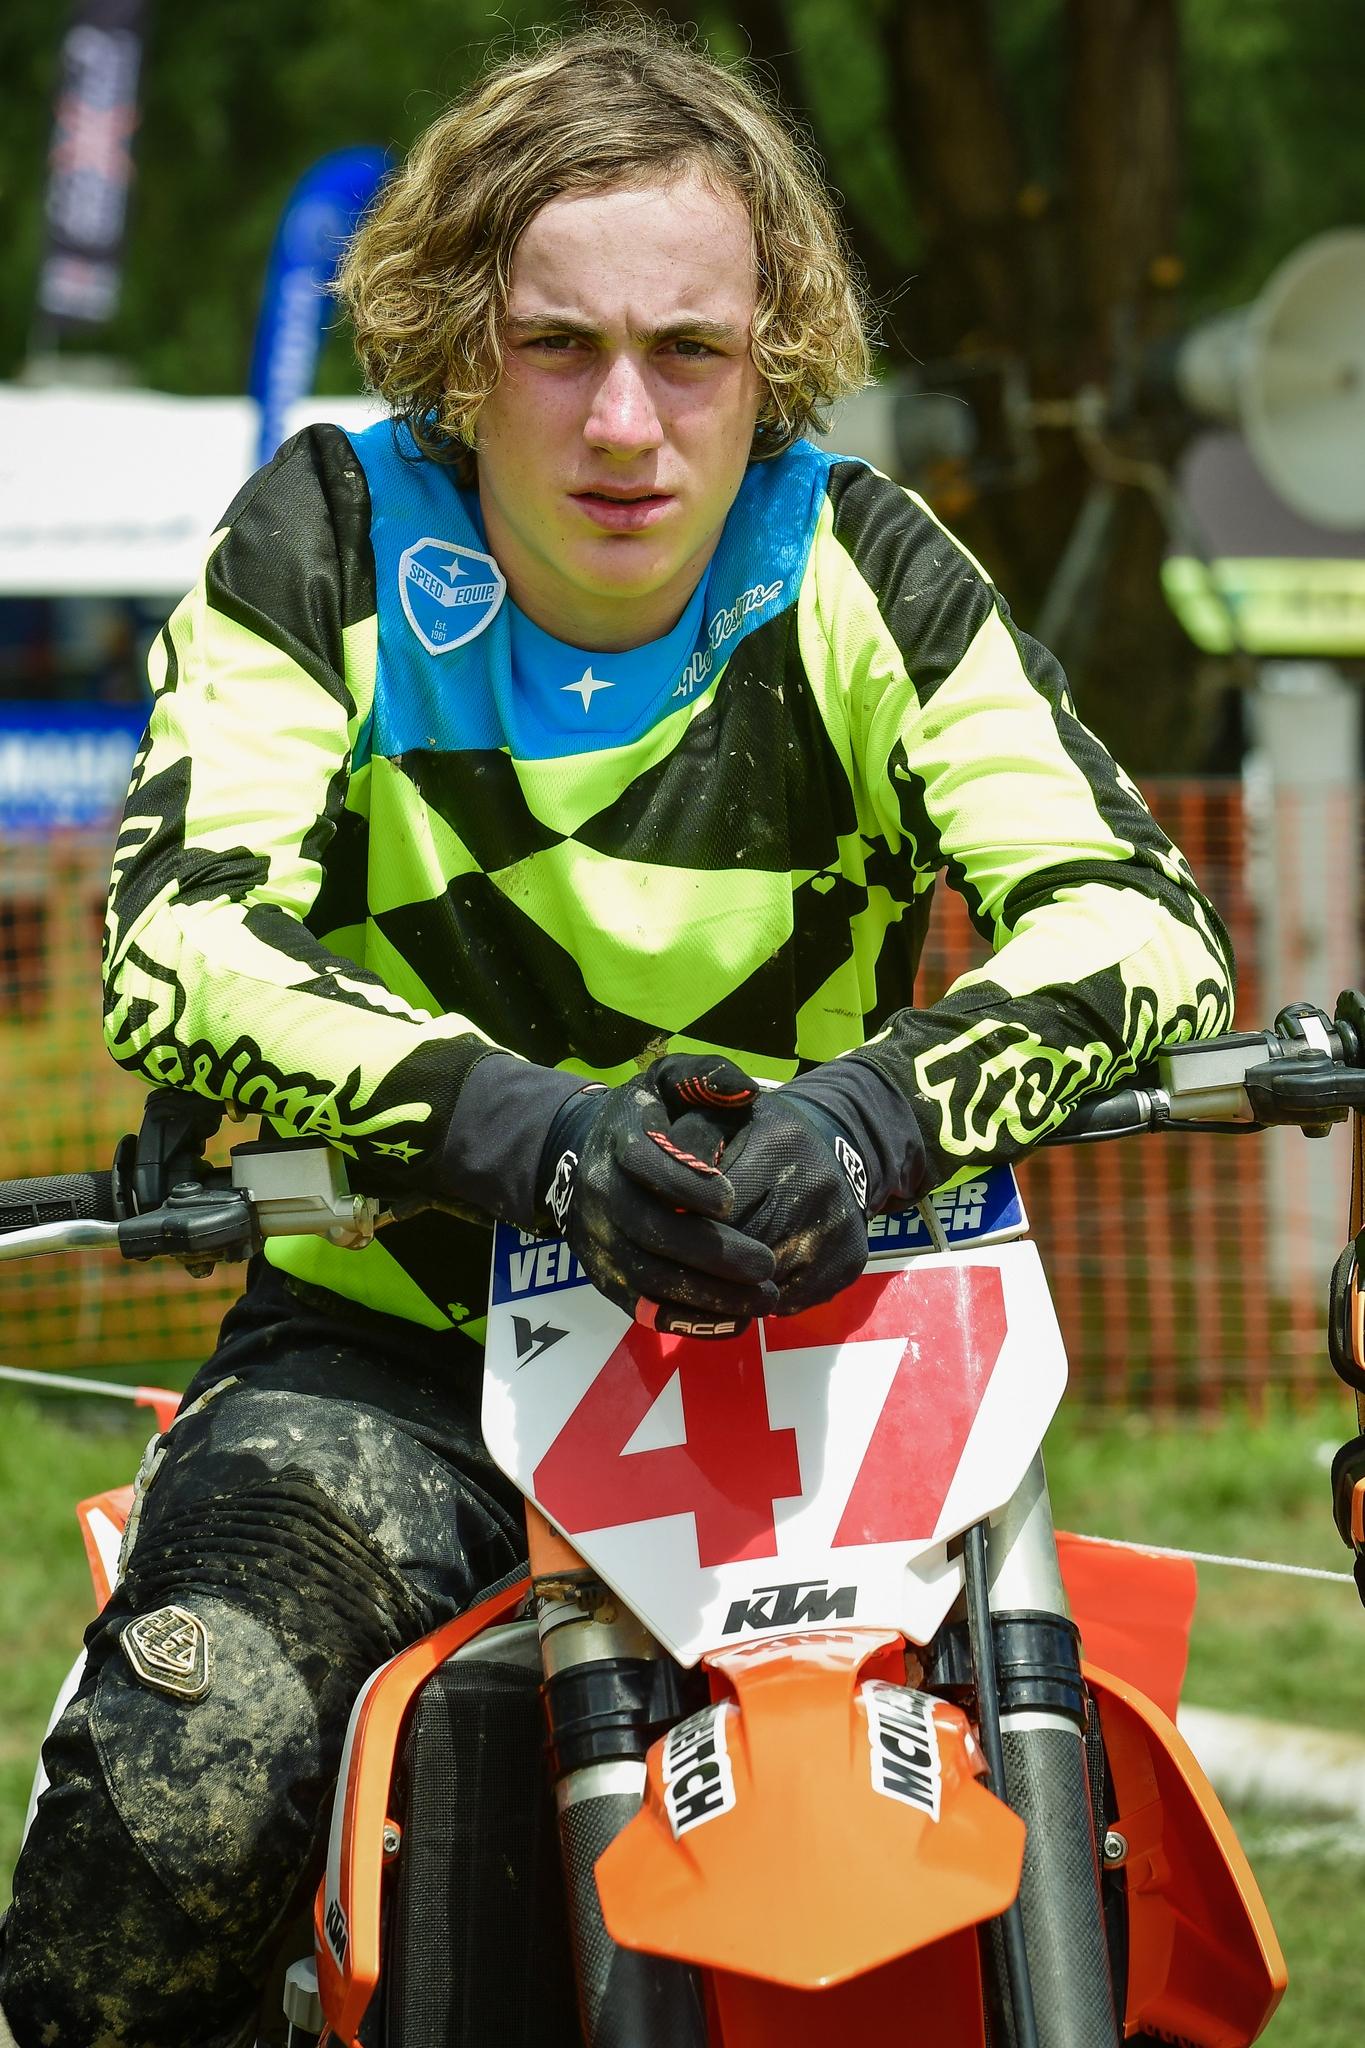 Otago's Grason Veitch, a multi-time former New Zealand motocross champion, victim of a motor...